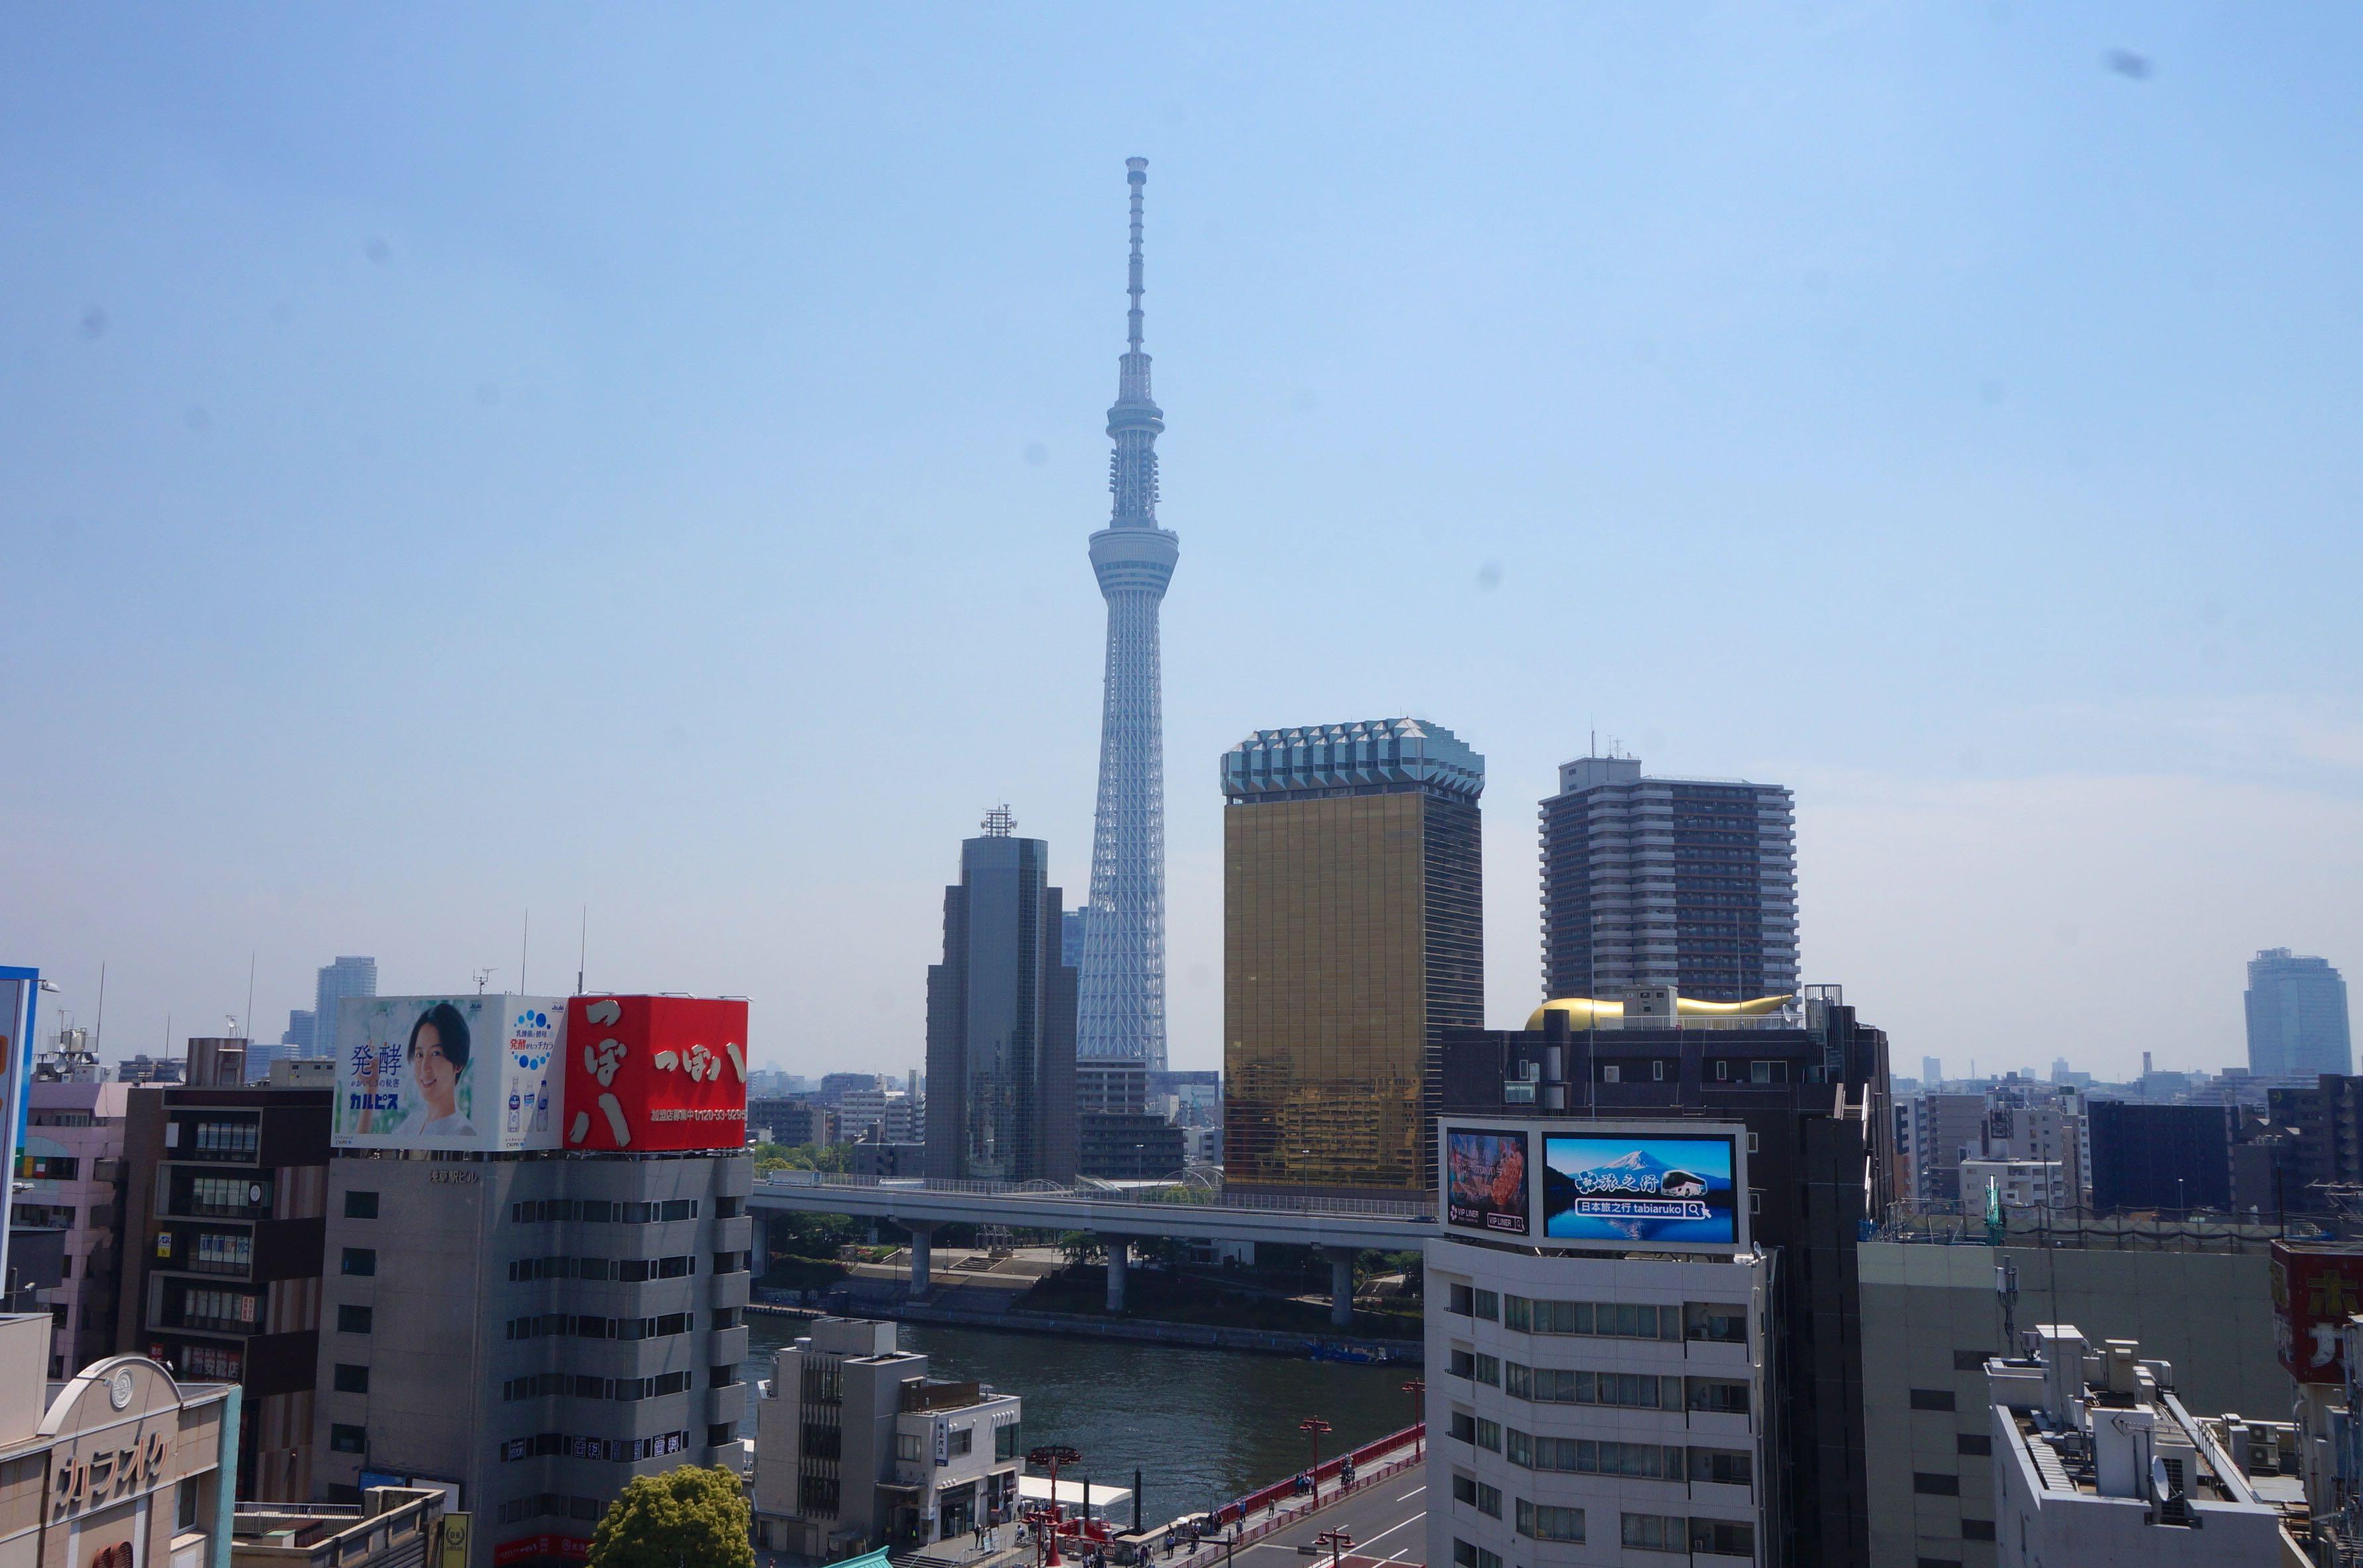 tokyo sky tree, tokyo, japon